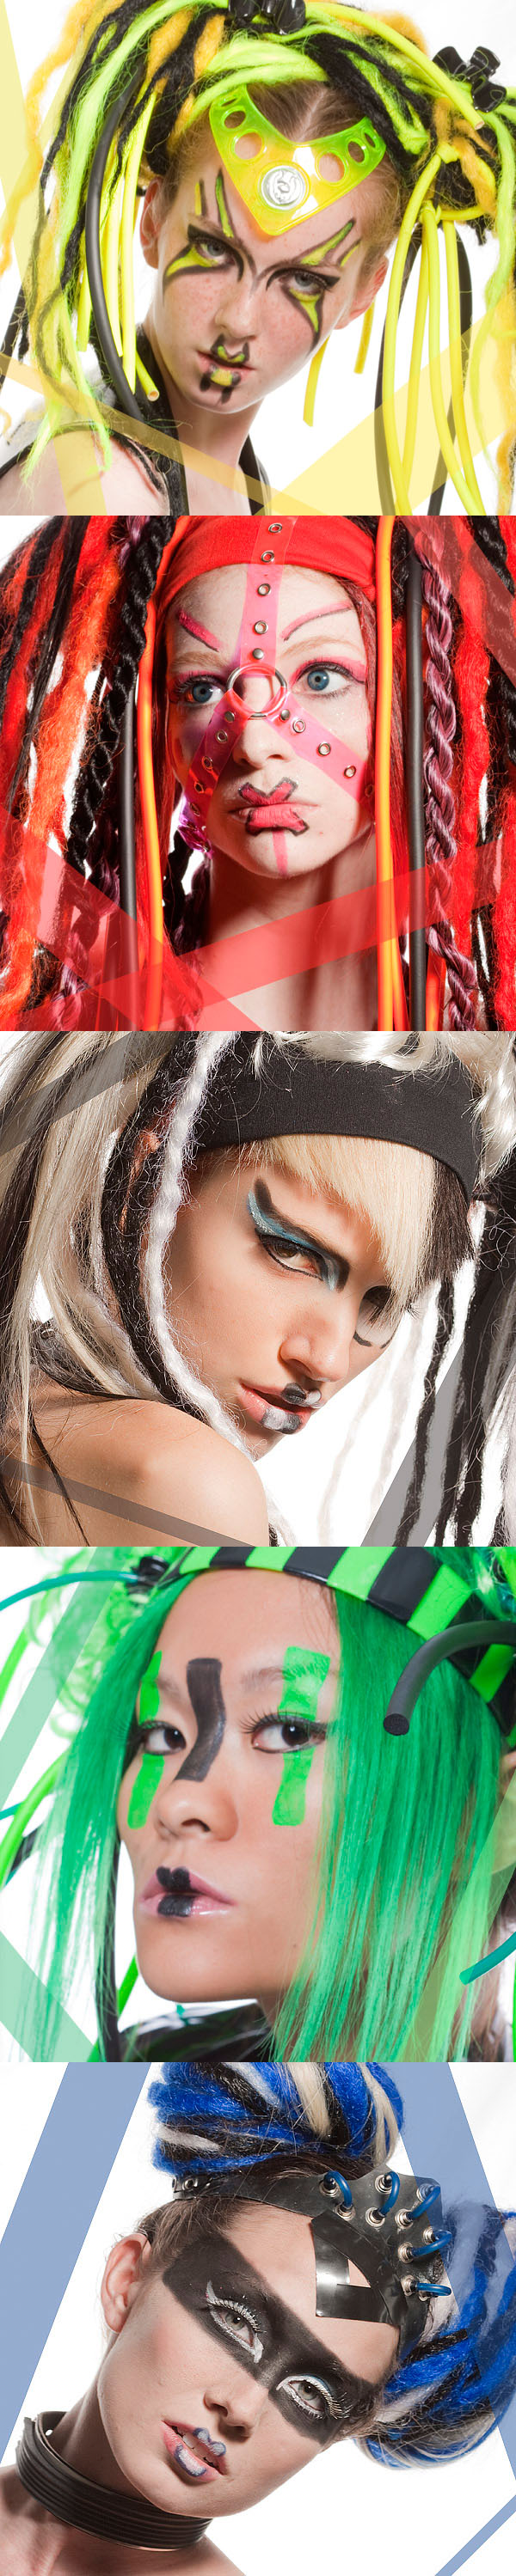 new  york Feb 23, 2010 Make Up & hair by Venus Pain / Isabelle Batz Fashion show @ stimulate event